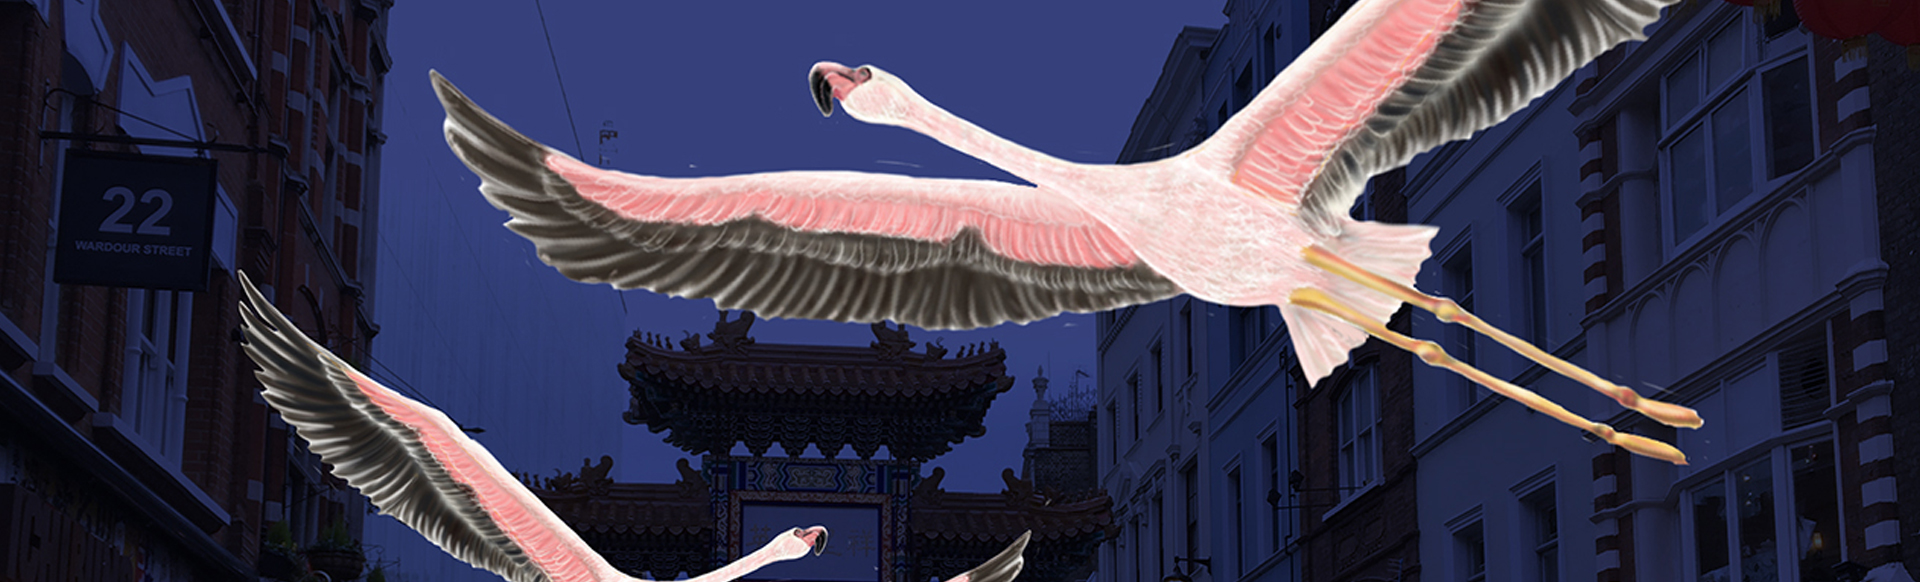 Flamingos Flyaway, Lumiere London 2018